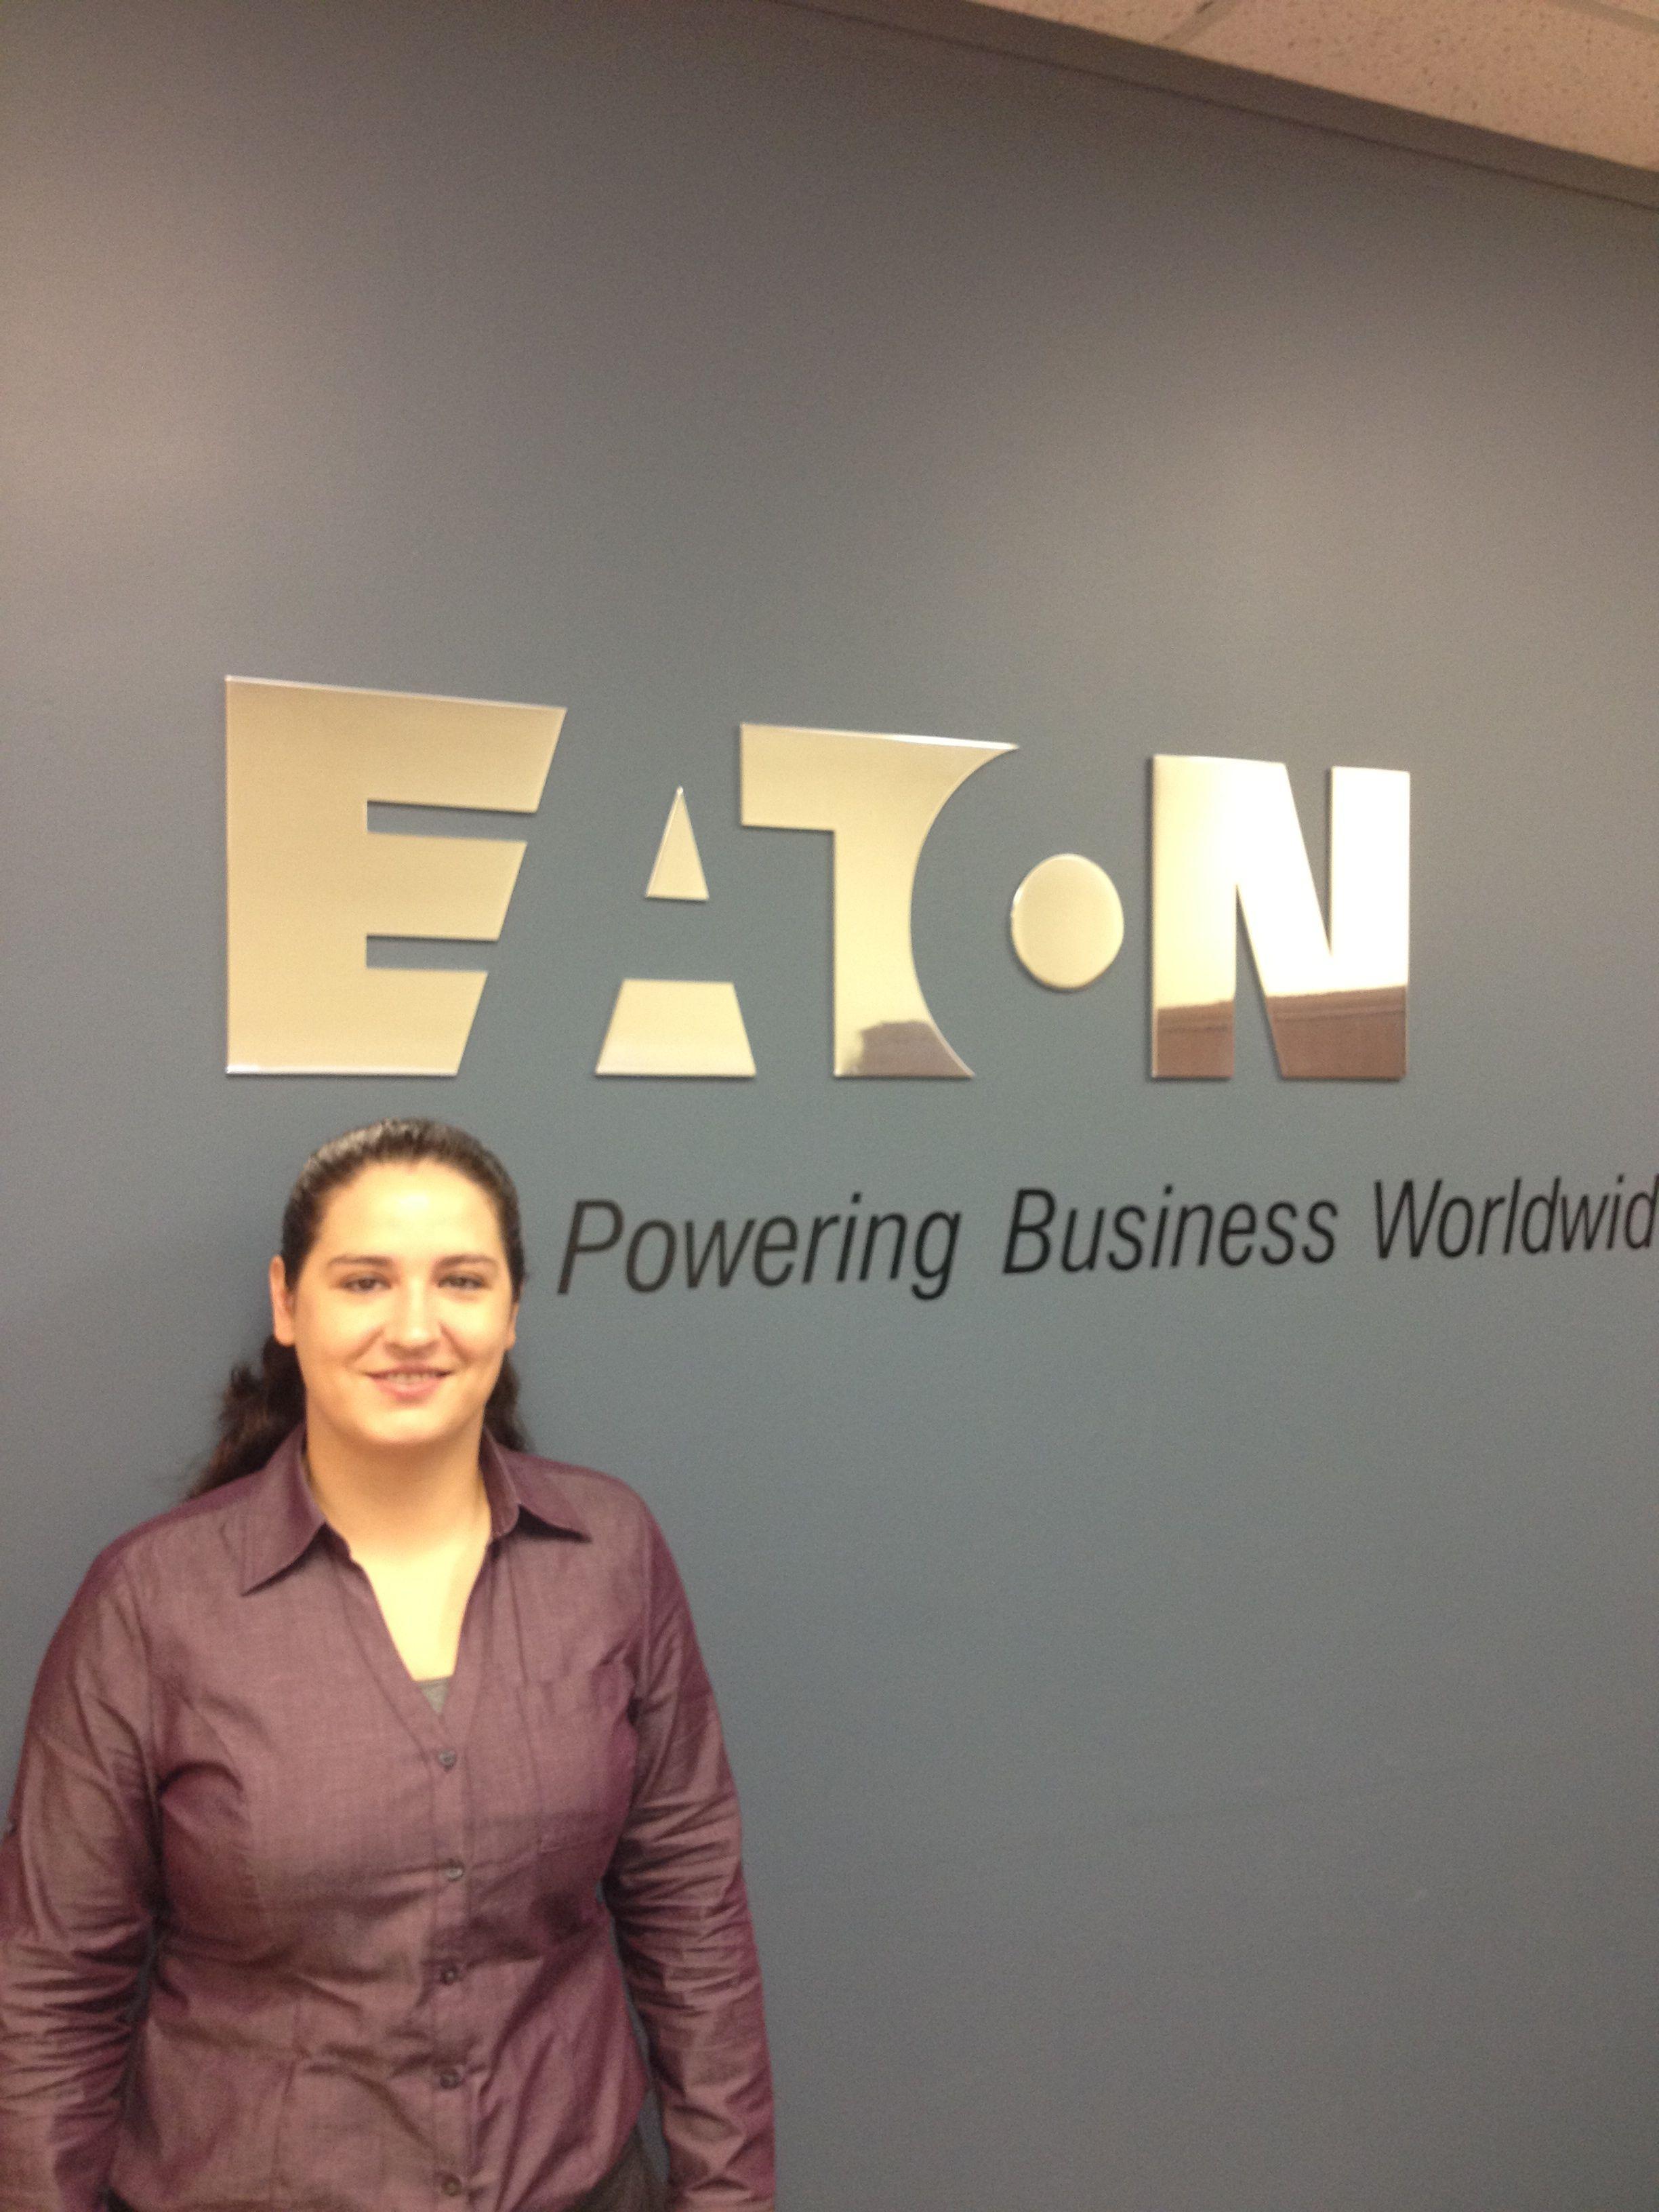 Tonya Johnson 3 2 Mba Class Of 2014 Major Accounting Internship Eaton Location Columbia Sc Eaton Job Search Career